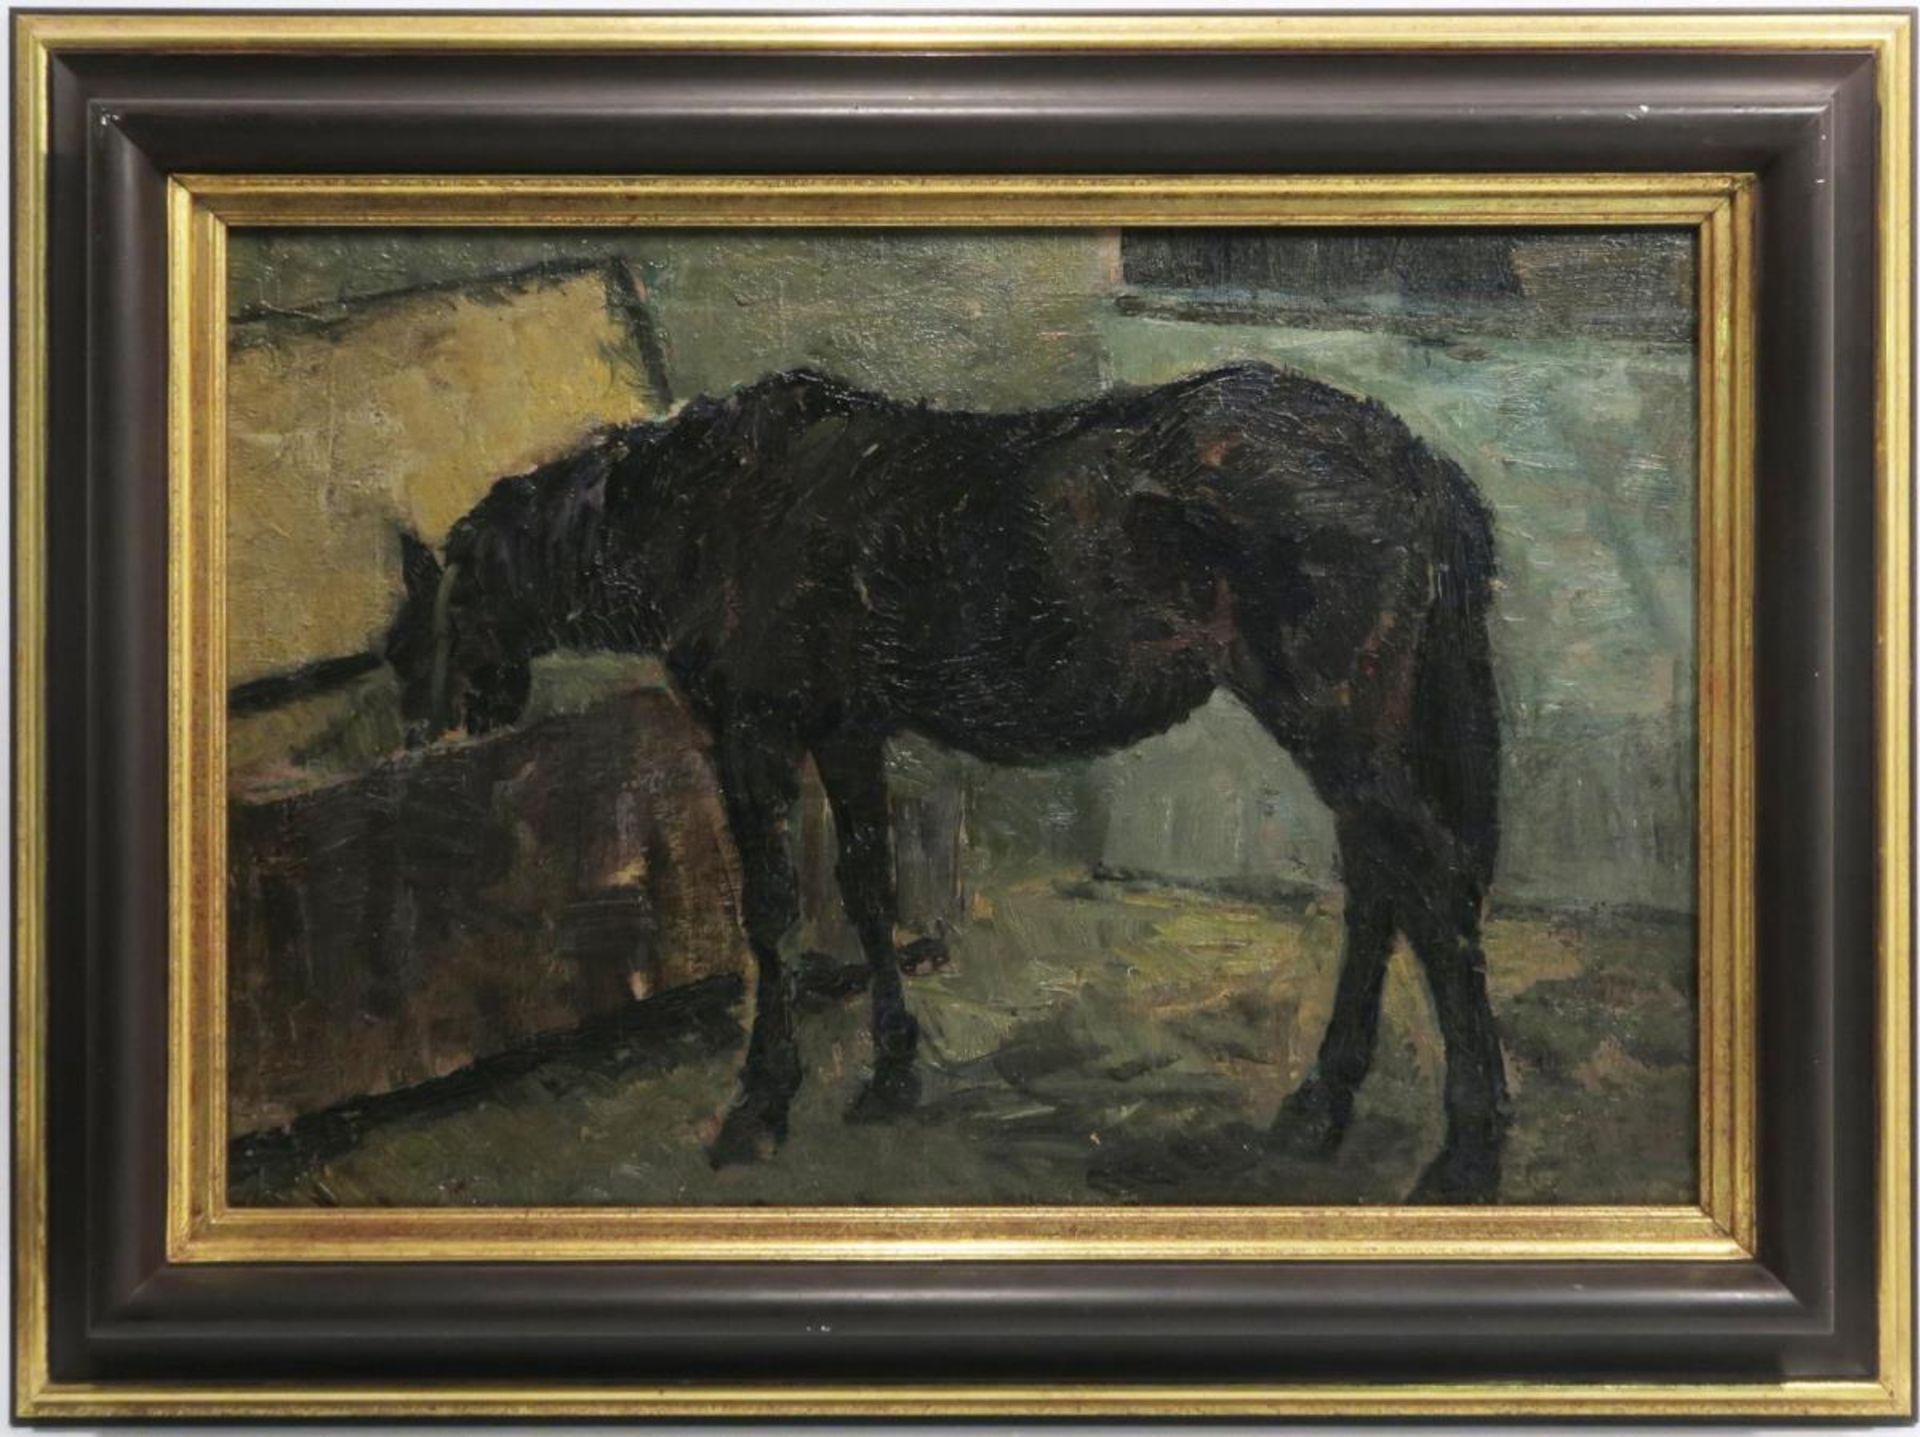 Pferd am Futtertrog